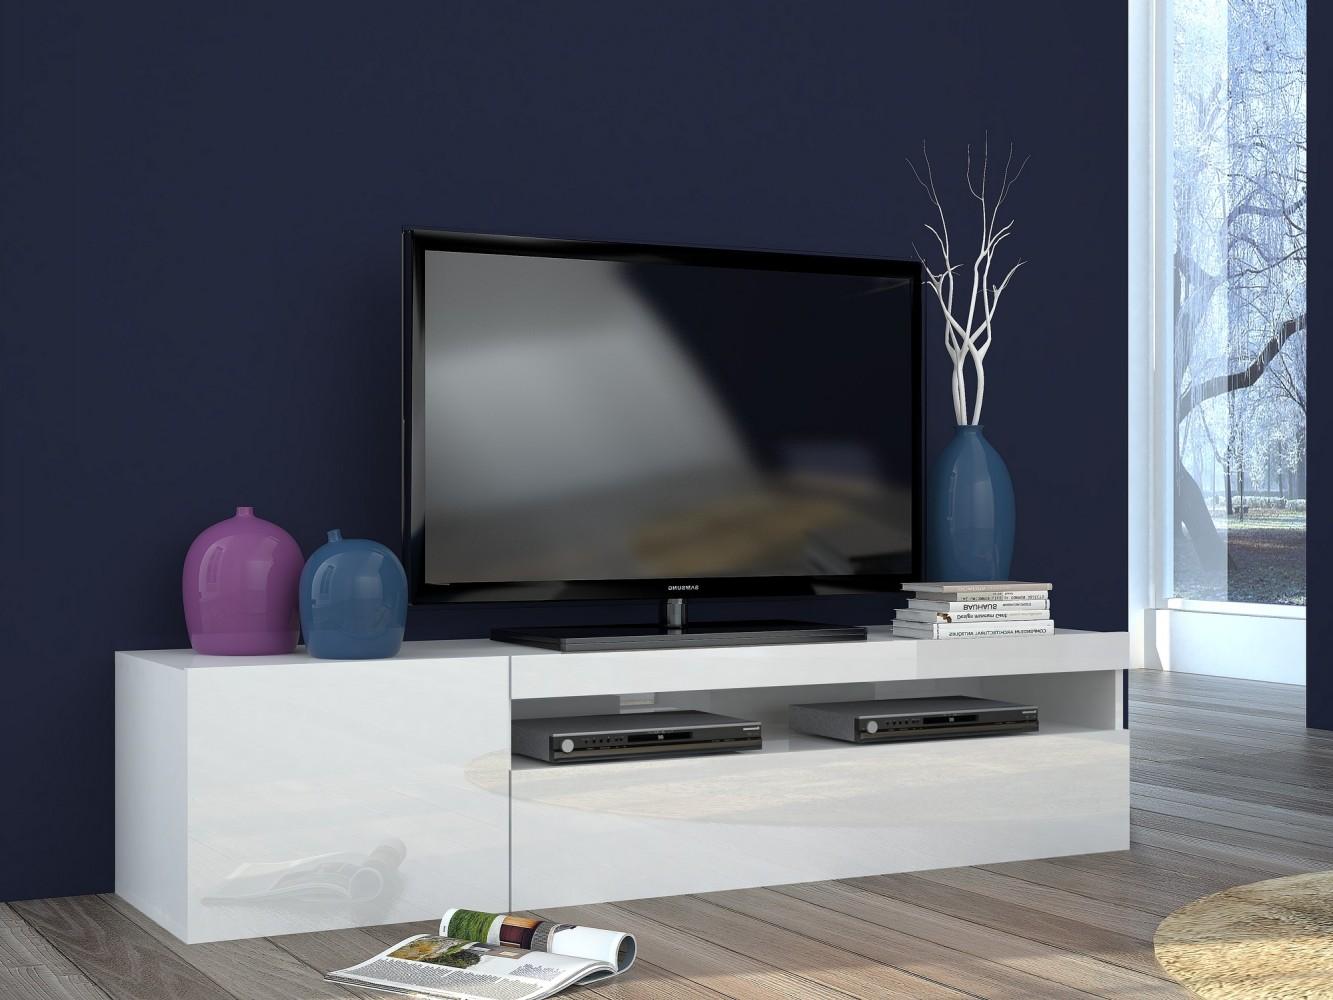 tecnos daiquiri lowboard 150cm wohnwand mediawand italian. Black Bedroom Furniture Sets. Home Design Ideas